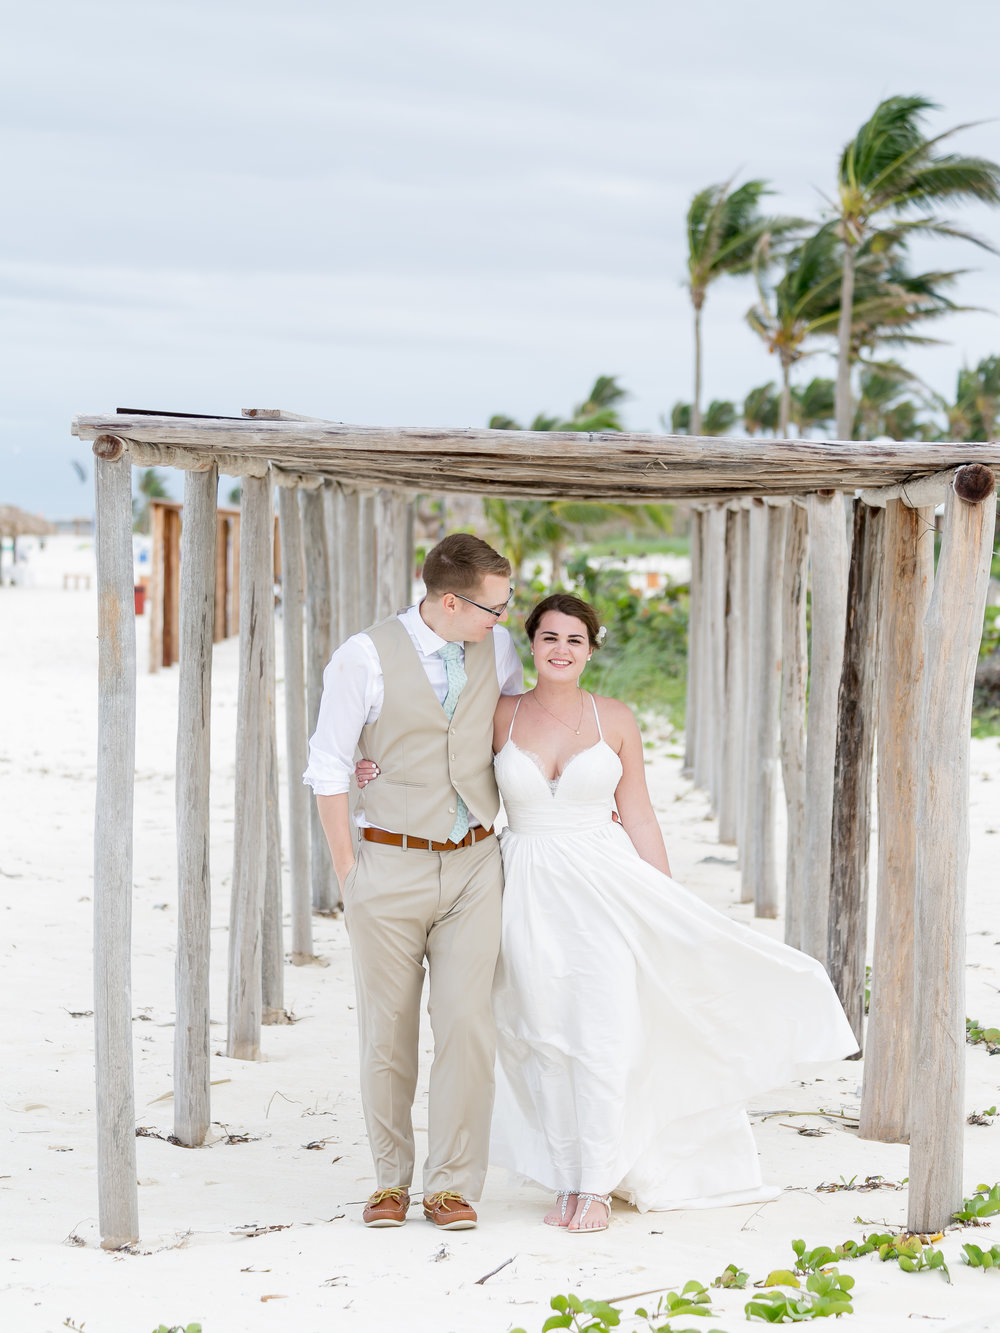 Cayco-Coco-Cuba-Wedding-514.jpg